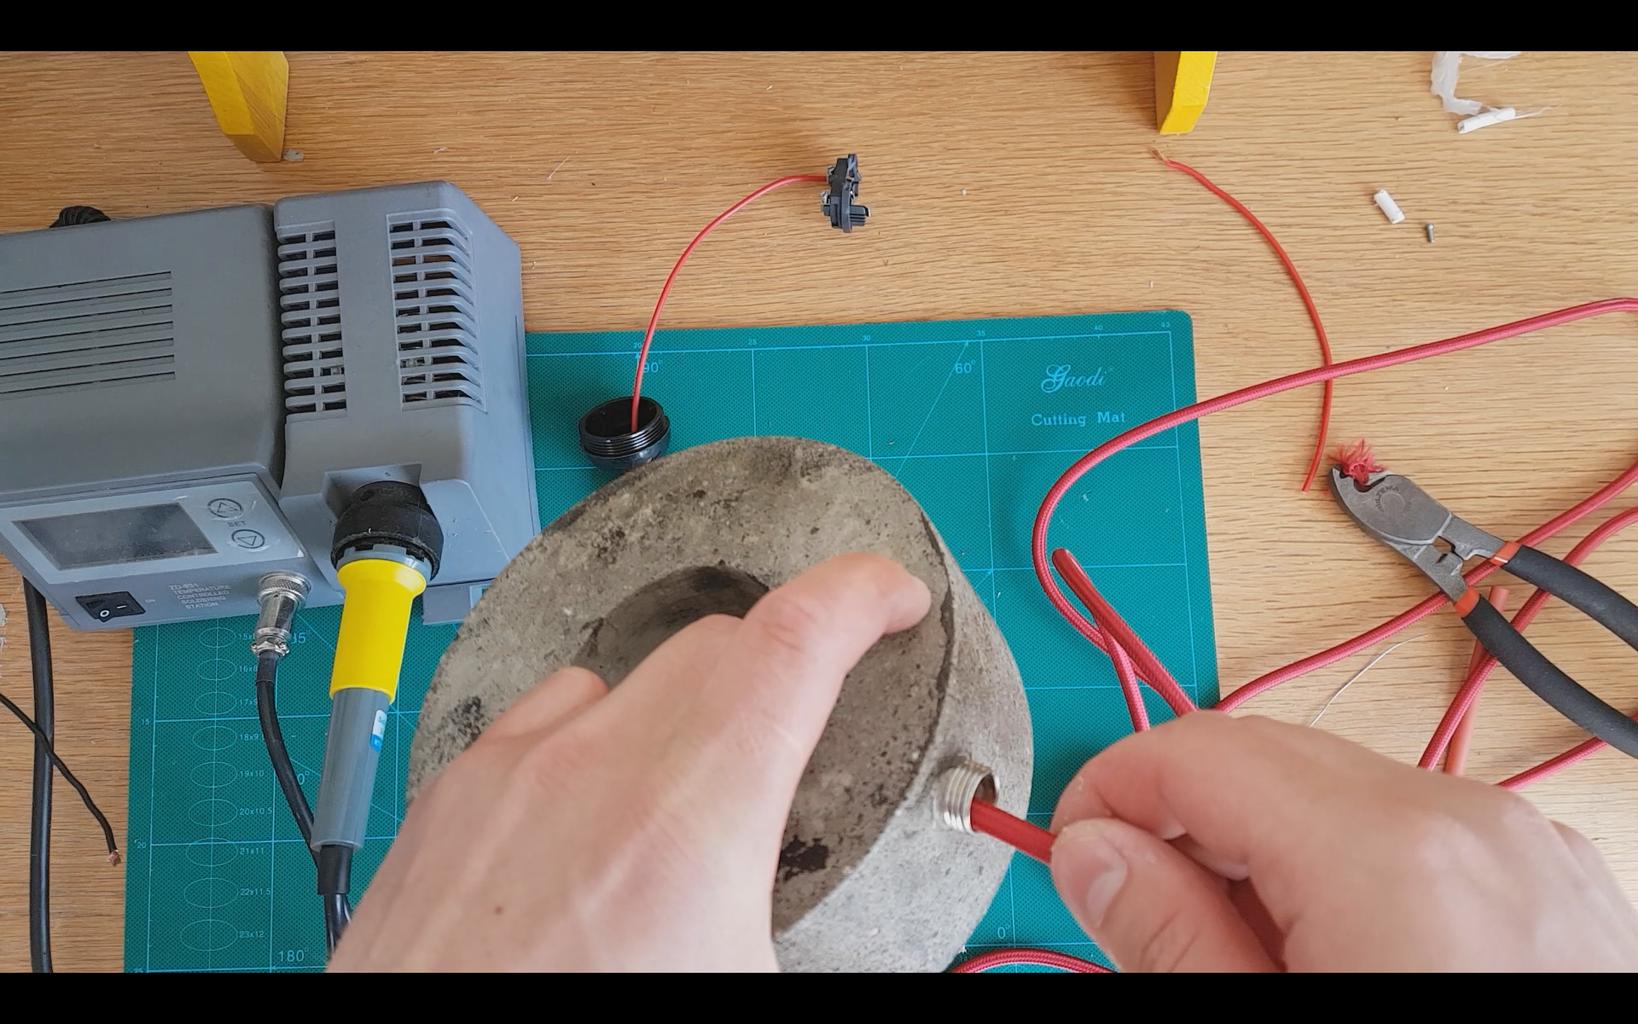 Assambley of Electrical Components